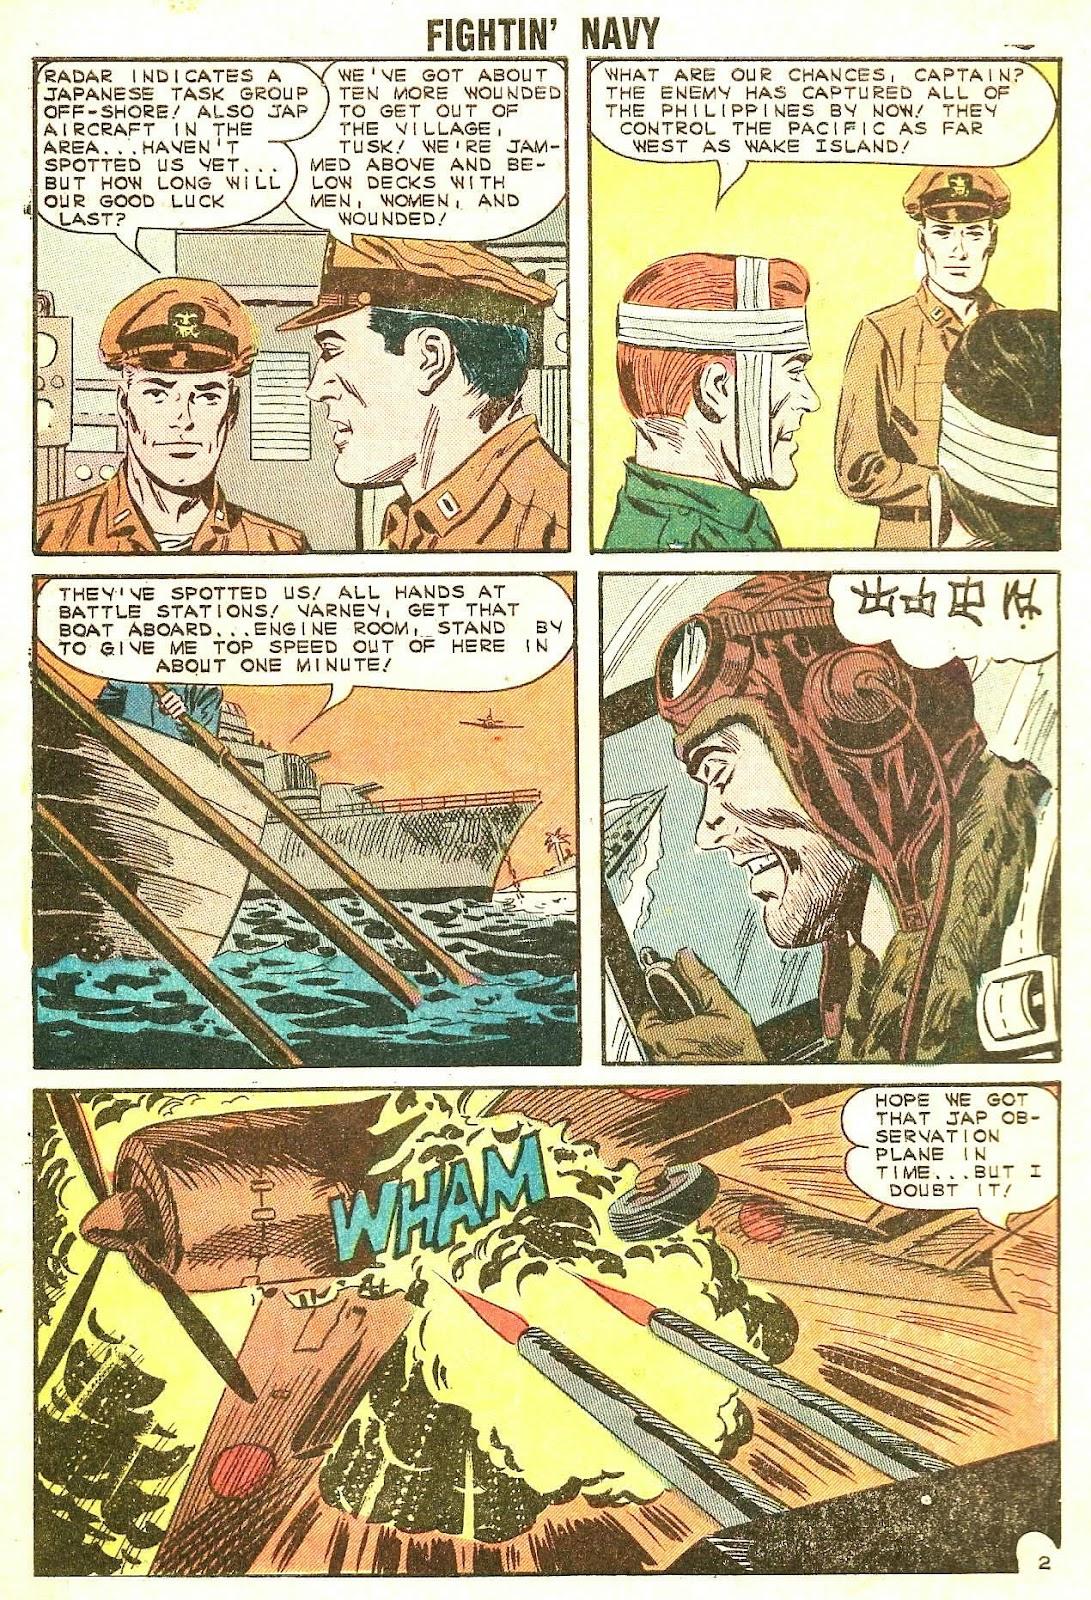 Read online Fightin' Navy comic -  Issue #114 - 4